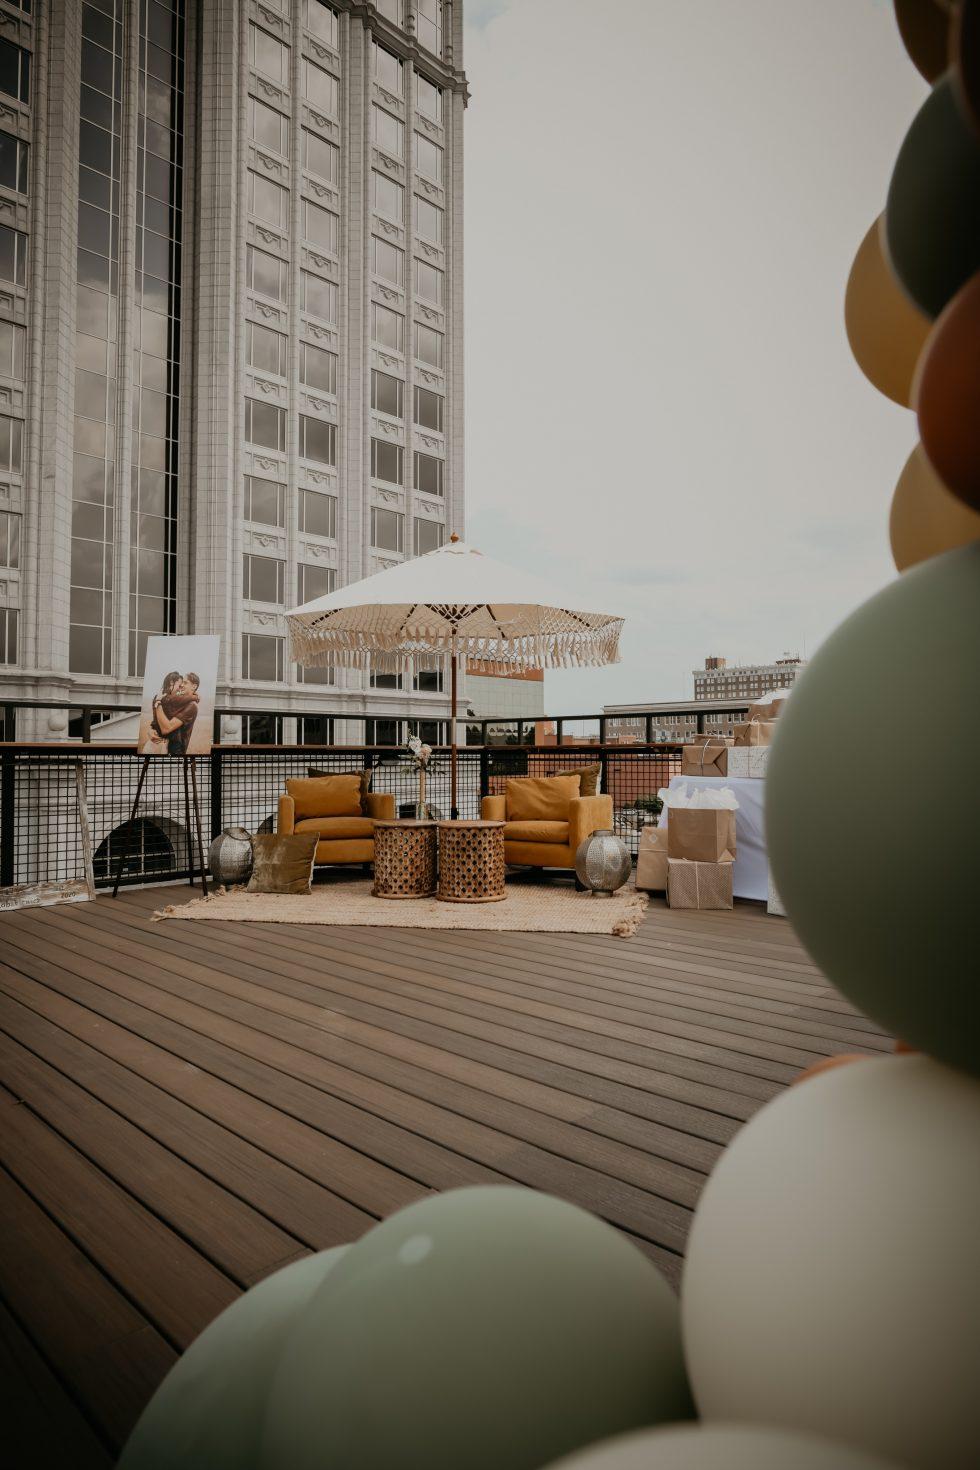 Kress-Terrace-Rooftop-Engagement-Party017